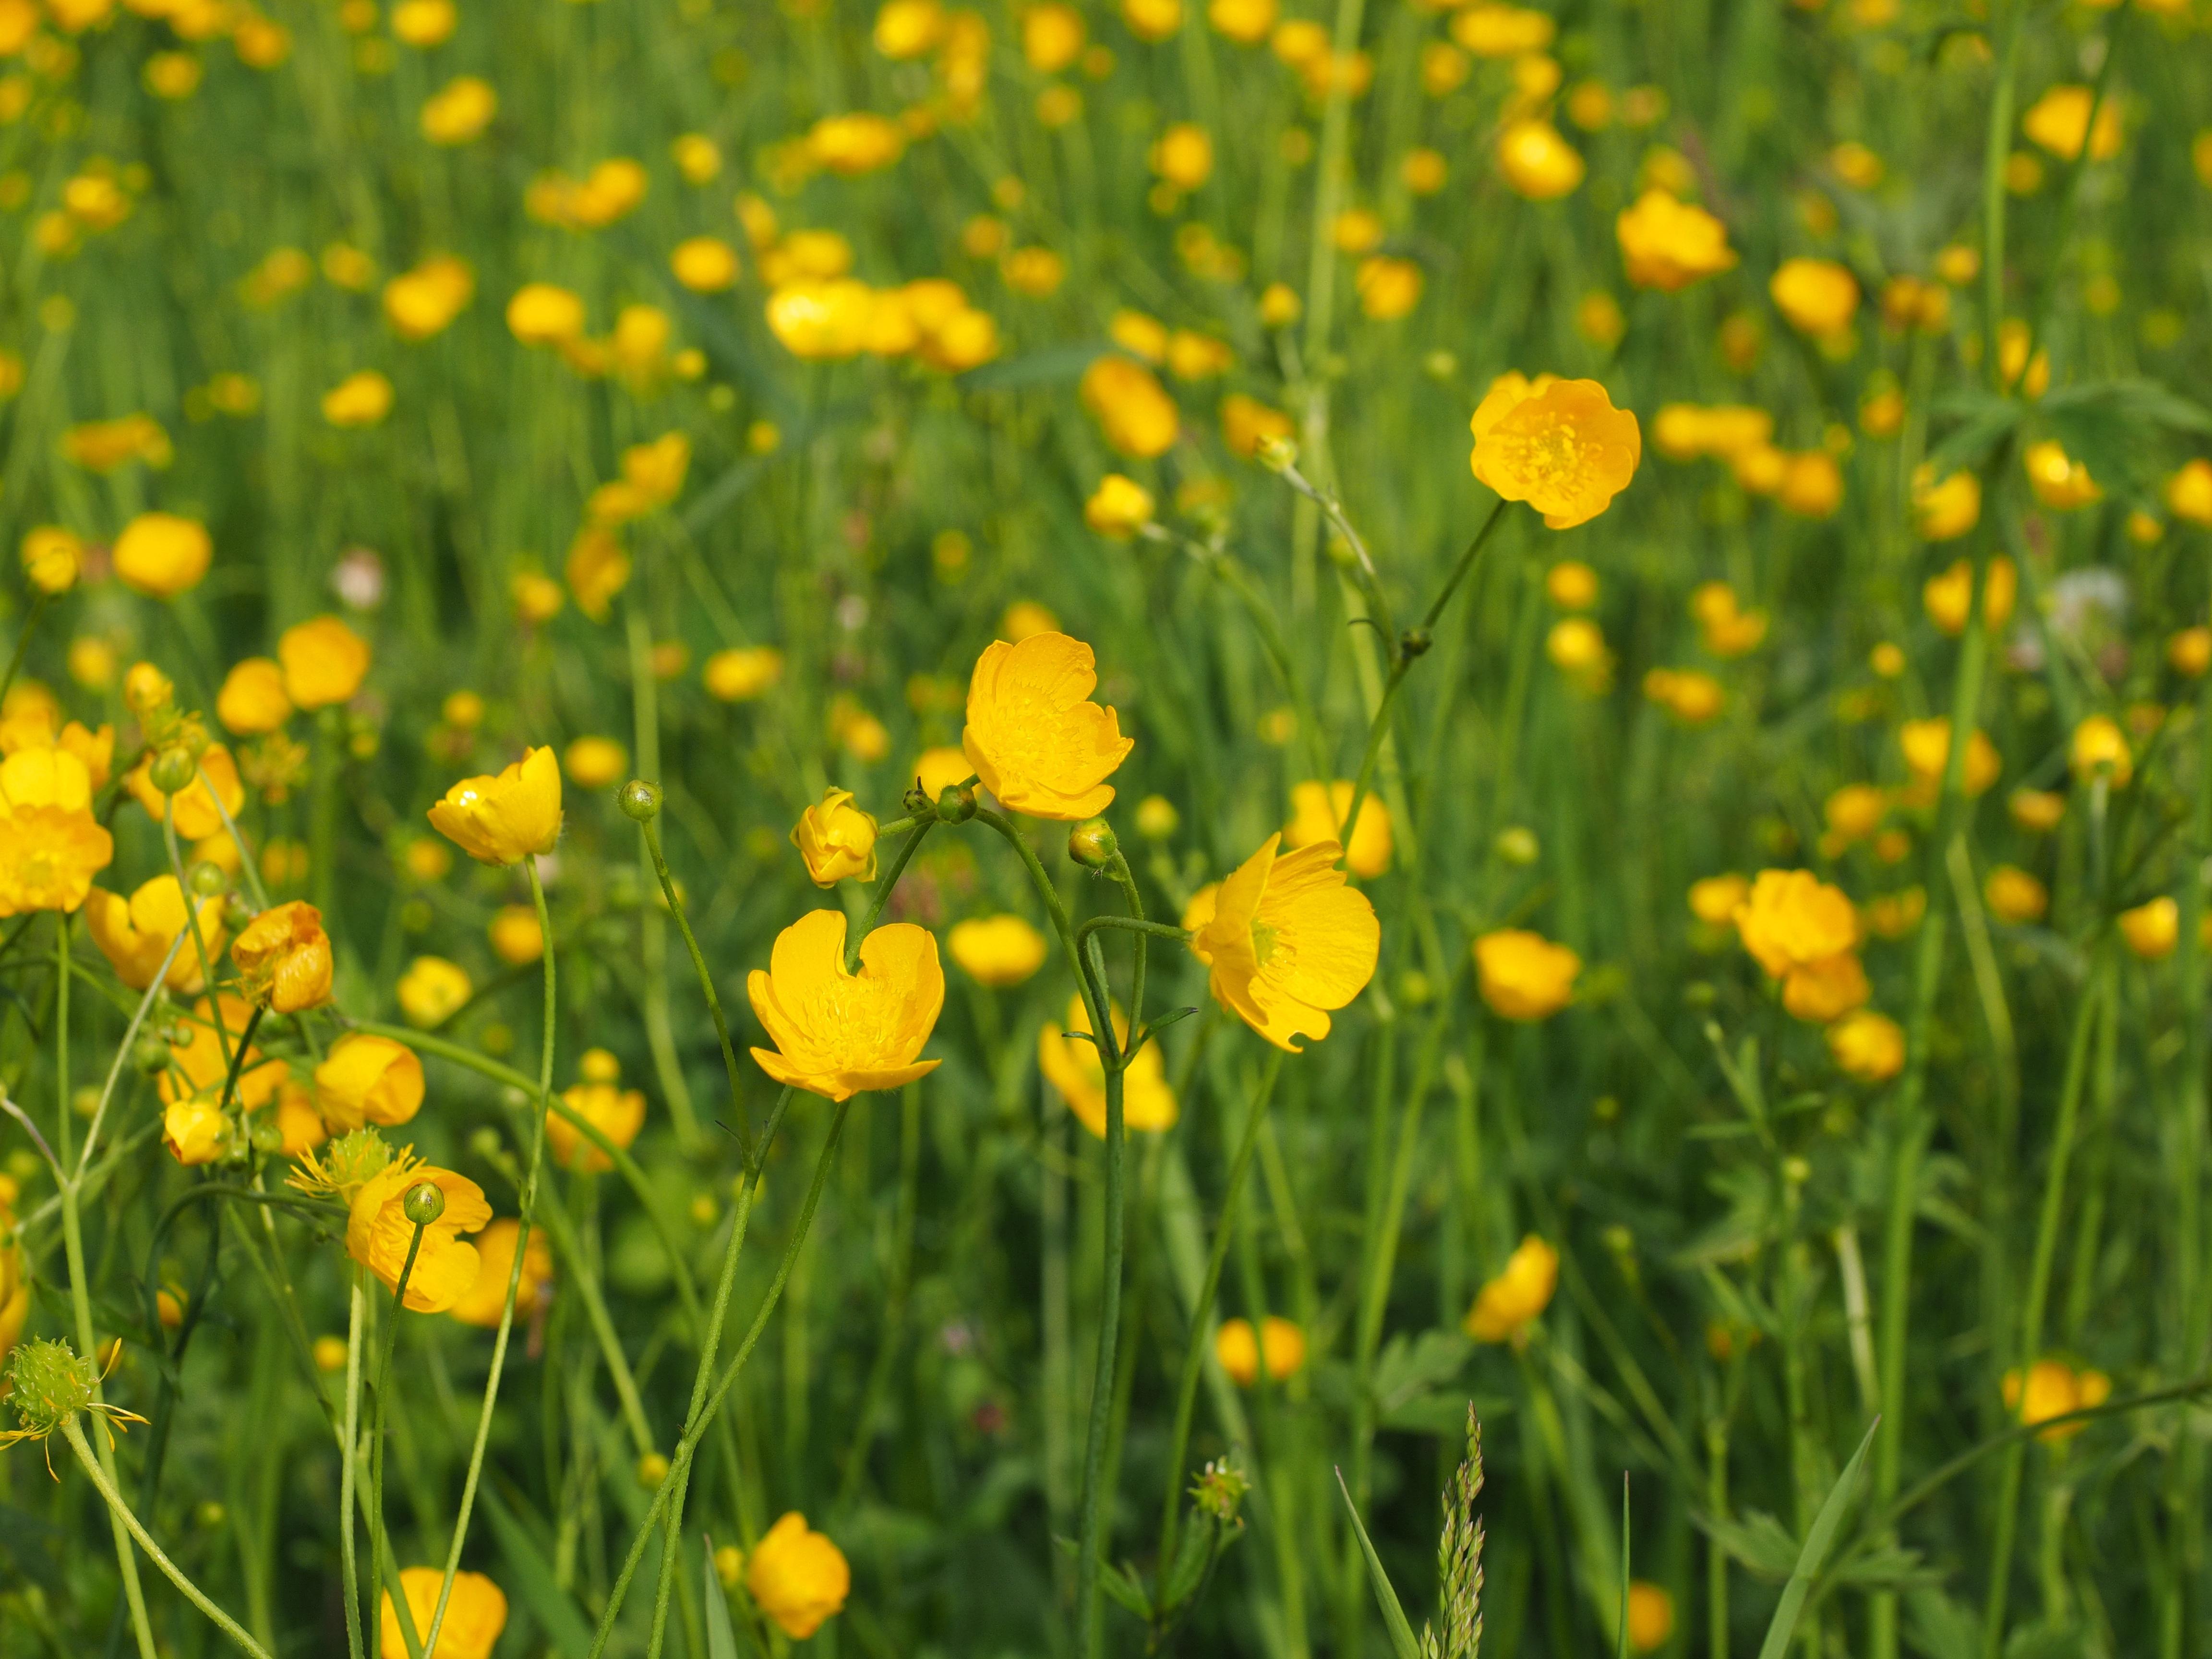 Free Images Nature Field Lawn Meadow Dandelion Prairie Green